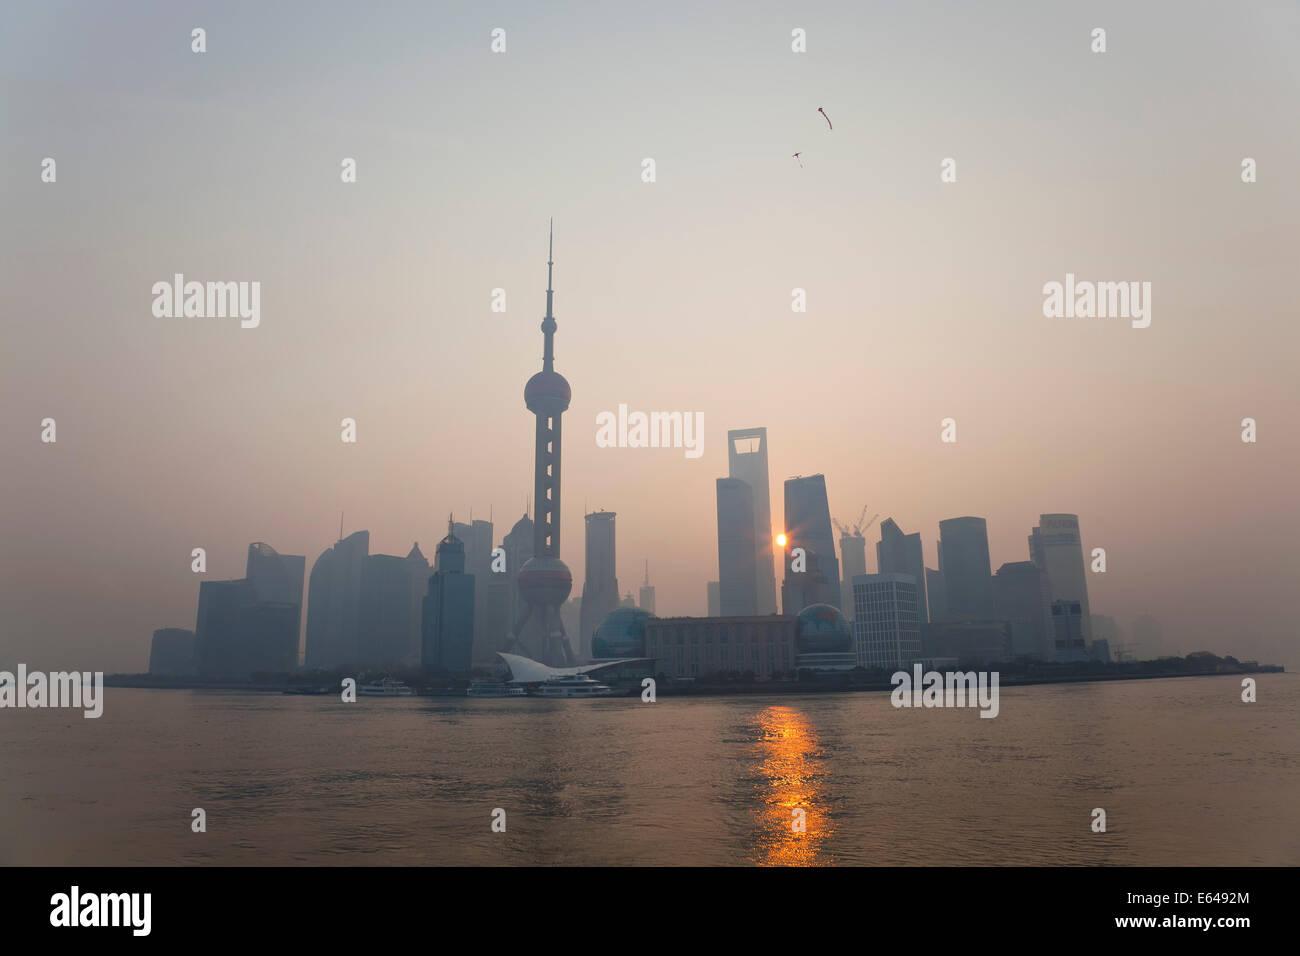 Sunrise oltre lo skyline di Pudong, Shanghai, Cina Immagini Stock